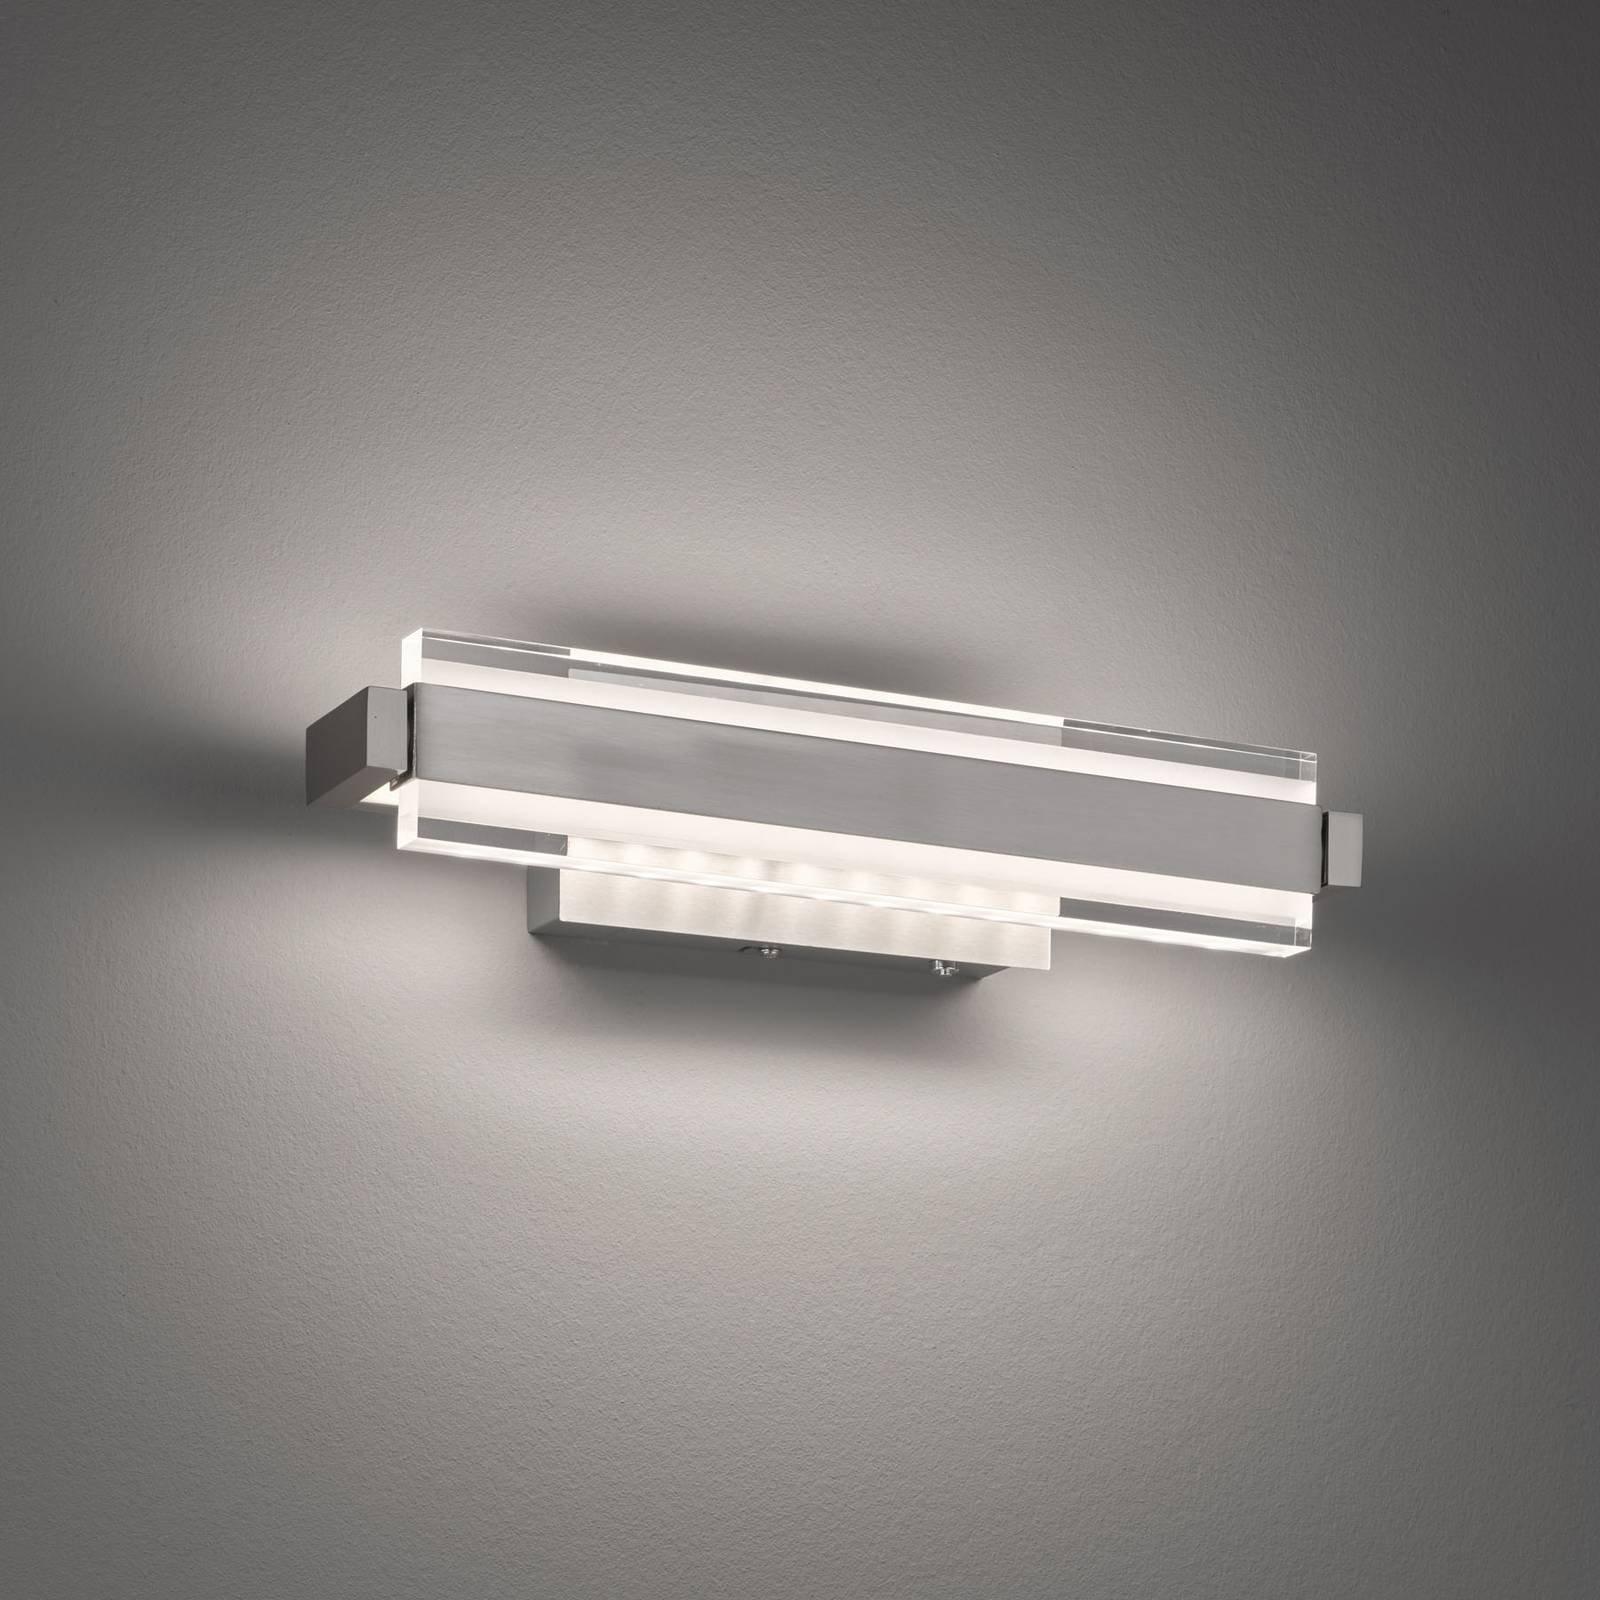 LED-vegglampe Z-Paros ZigBee fjernkontroll Touch